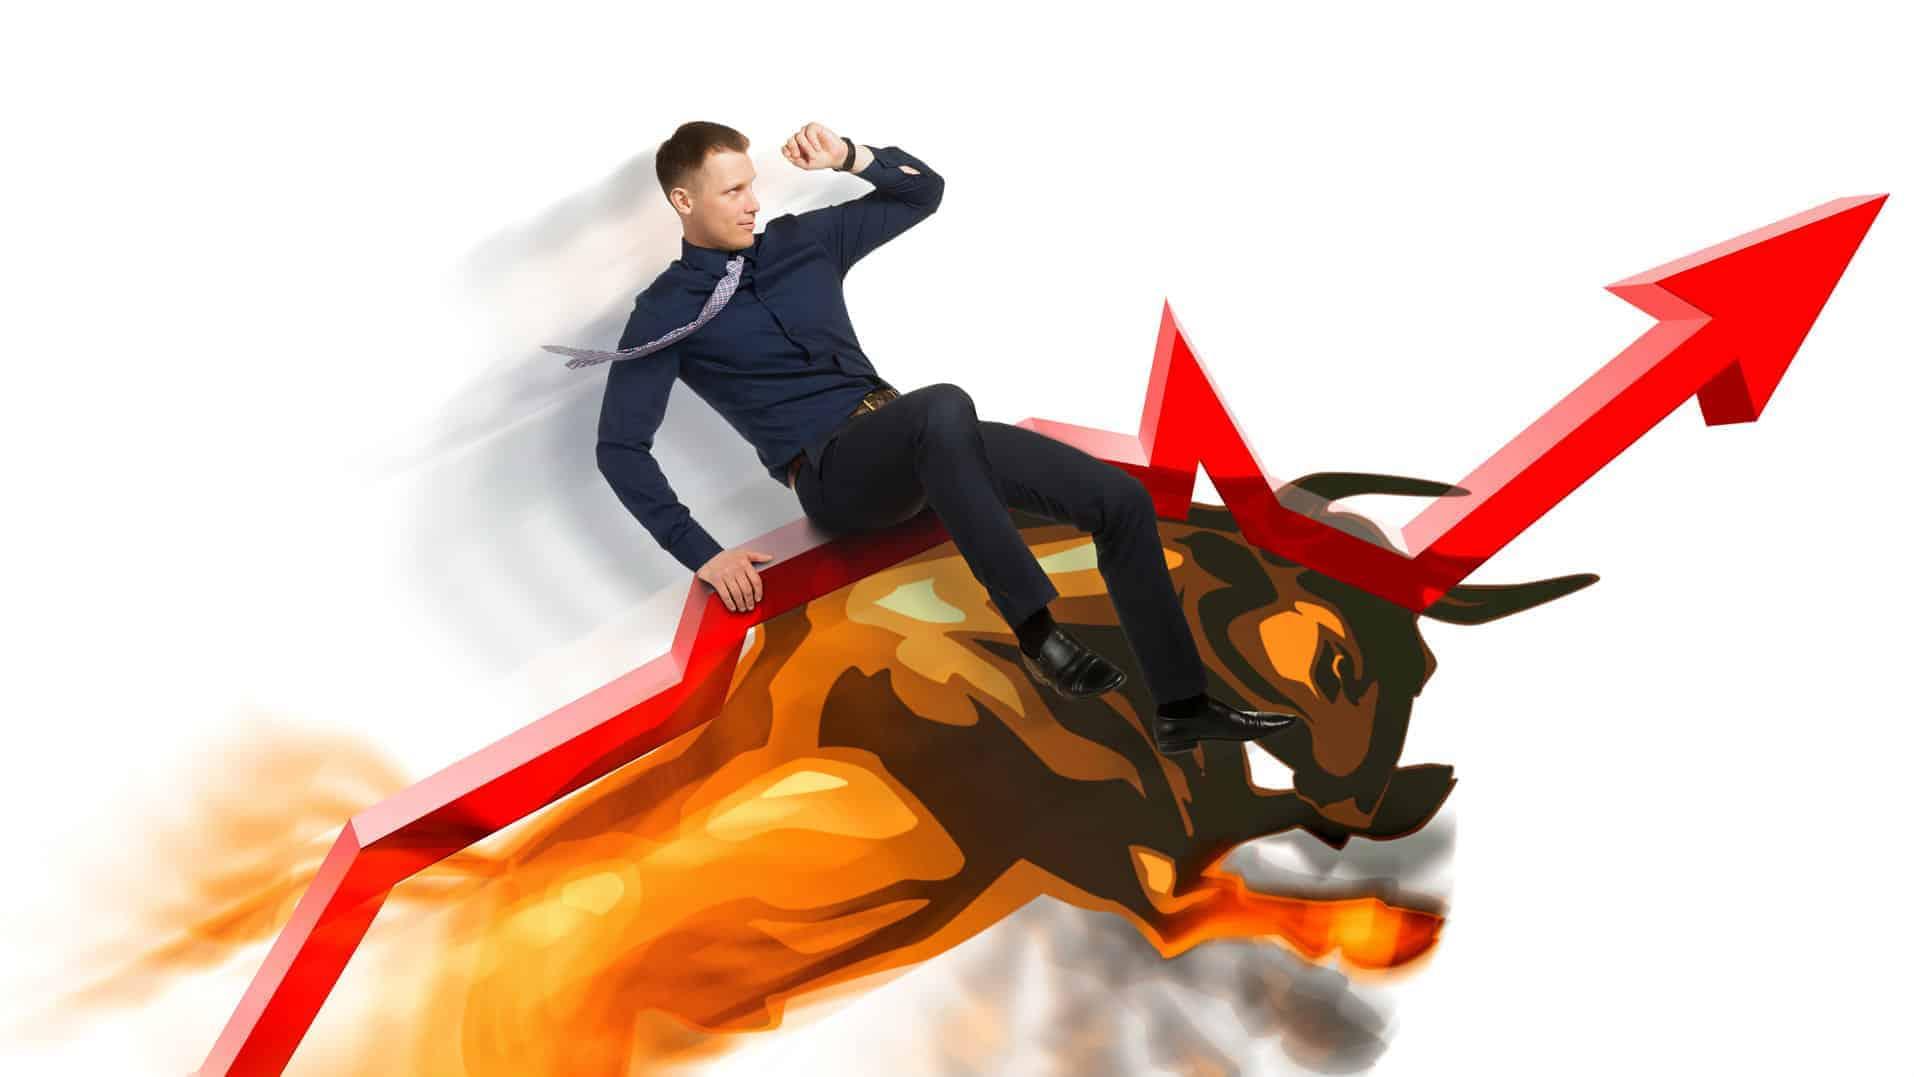 man riding bull on an upward trending arrow